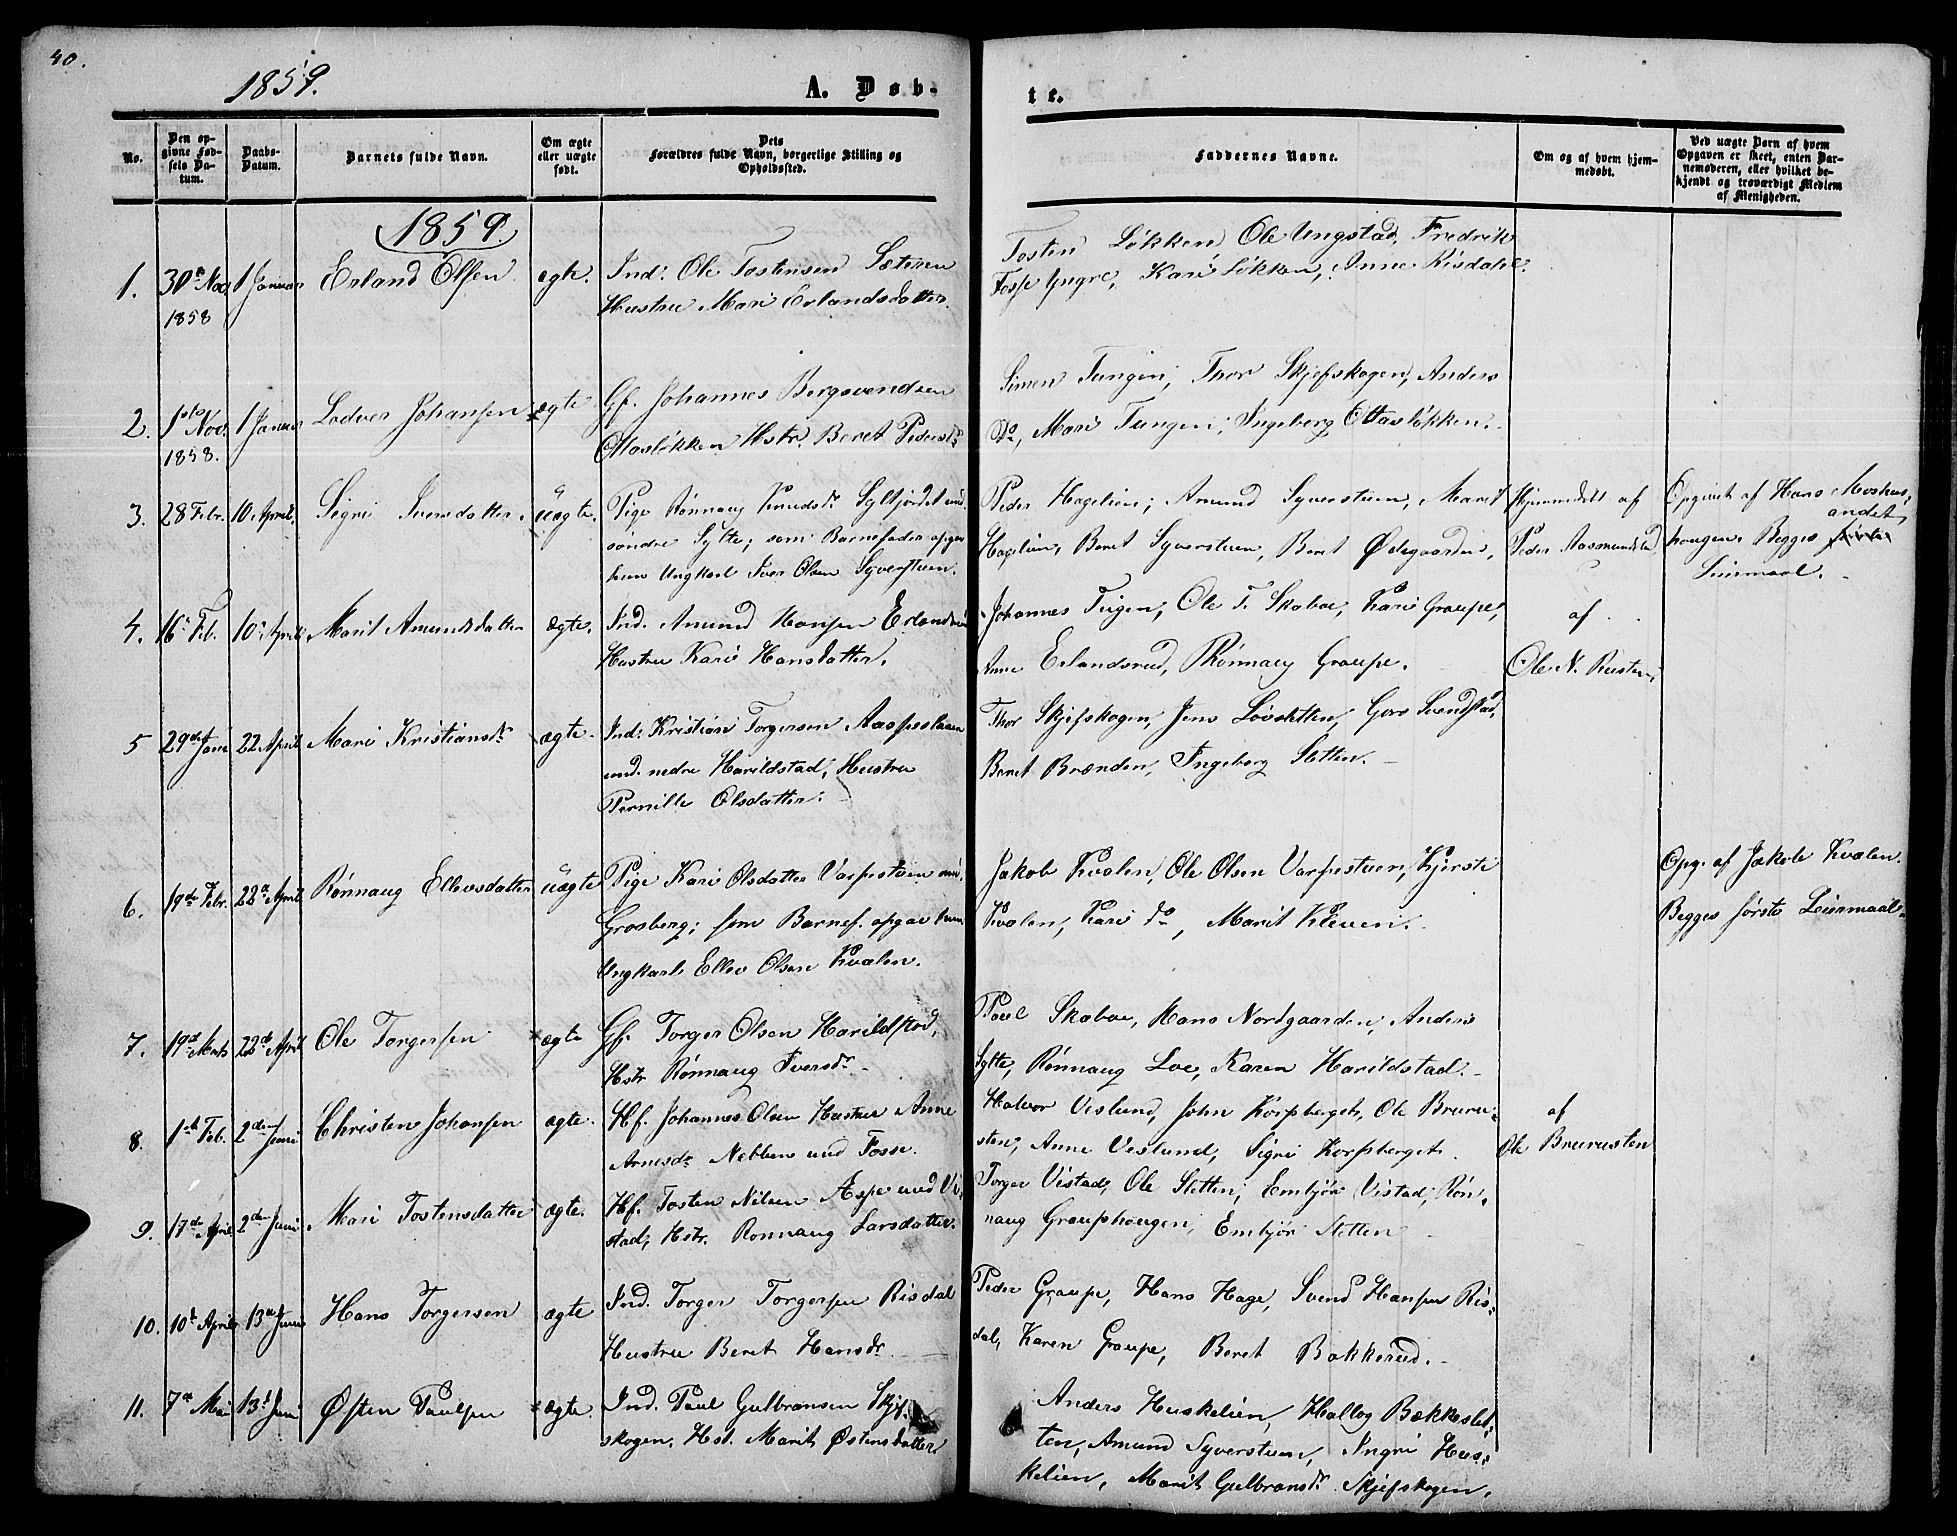 SAH, Nord-Fron prestekontor, Klokkerbok nr. 2, 1851-1883, s. 40